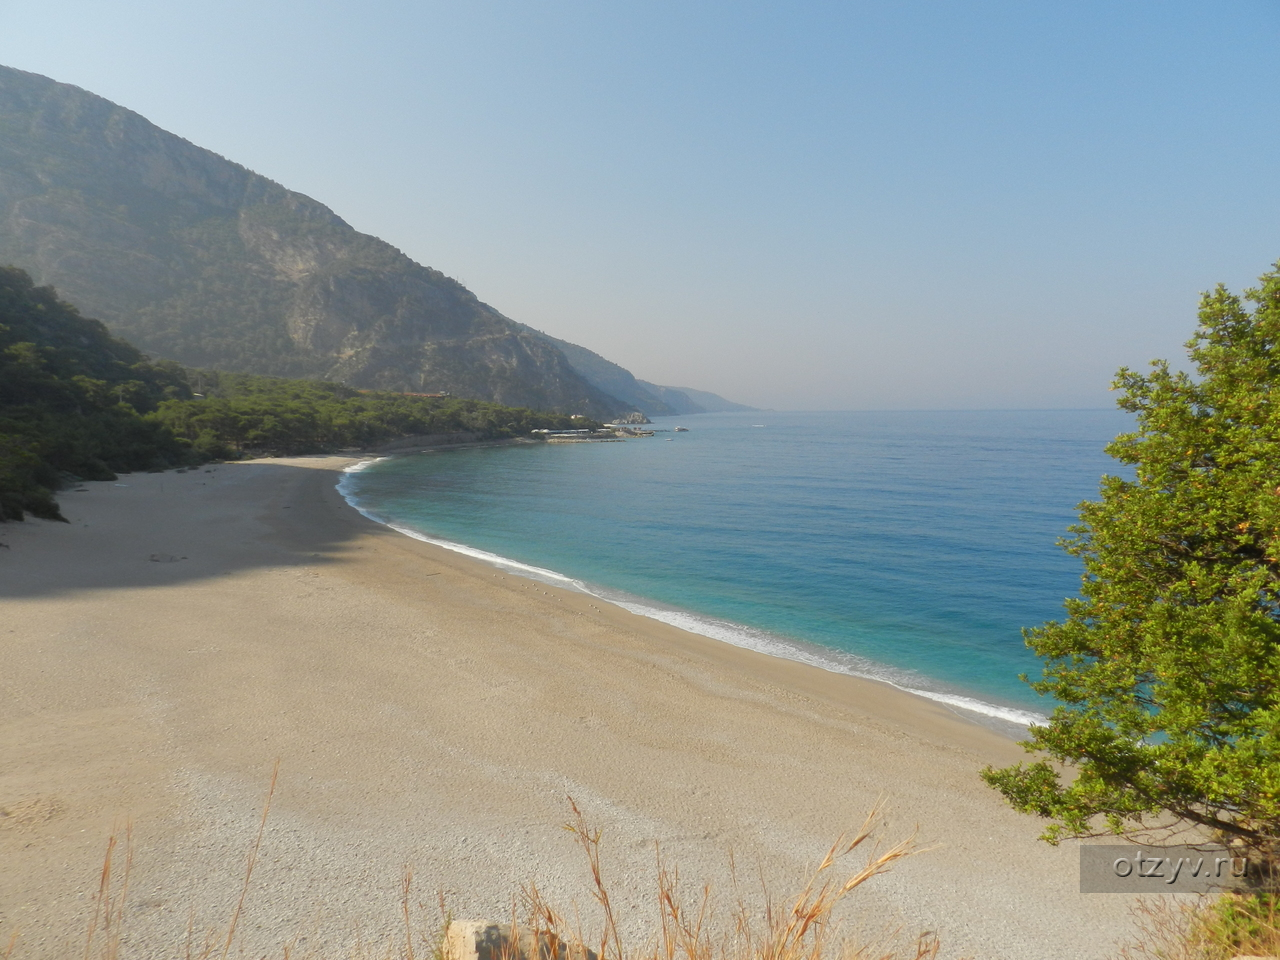 пляжи констанцы румыния фото